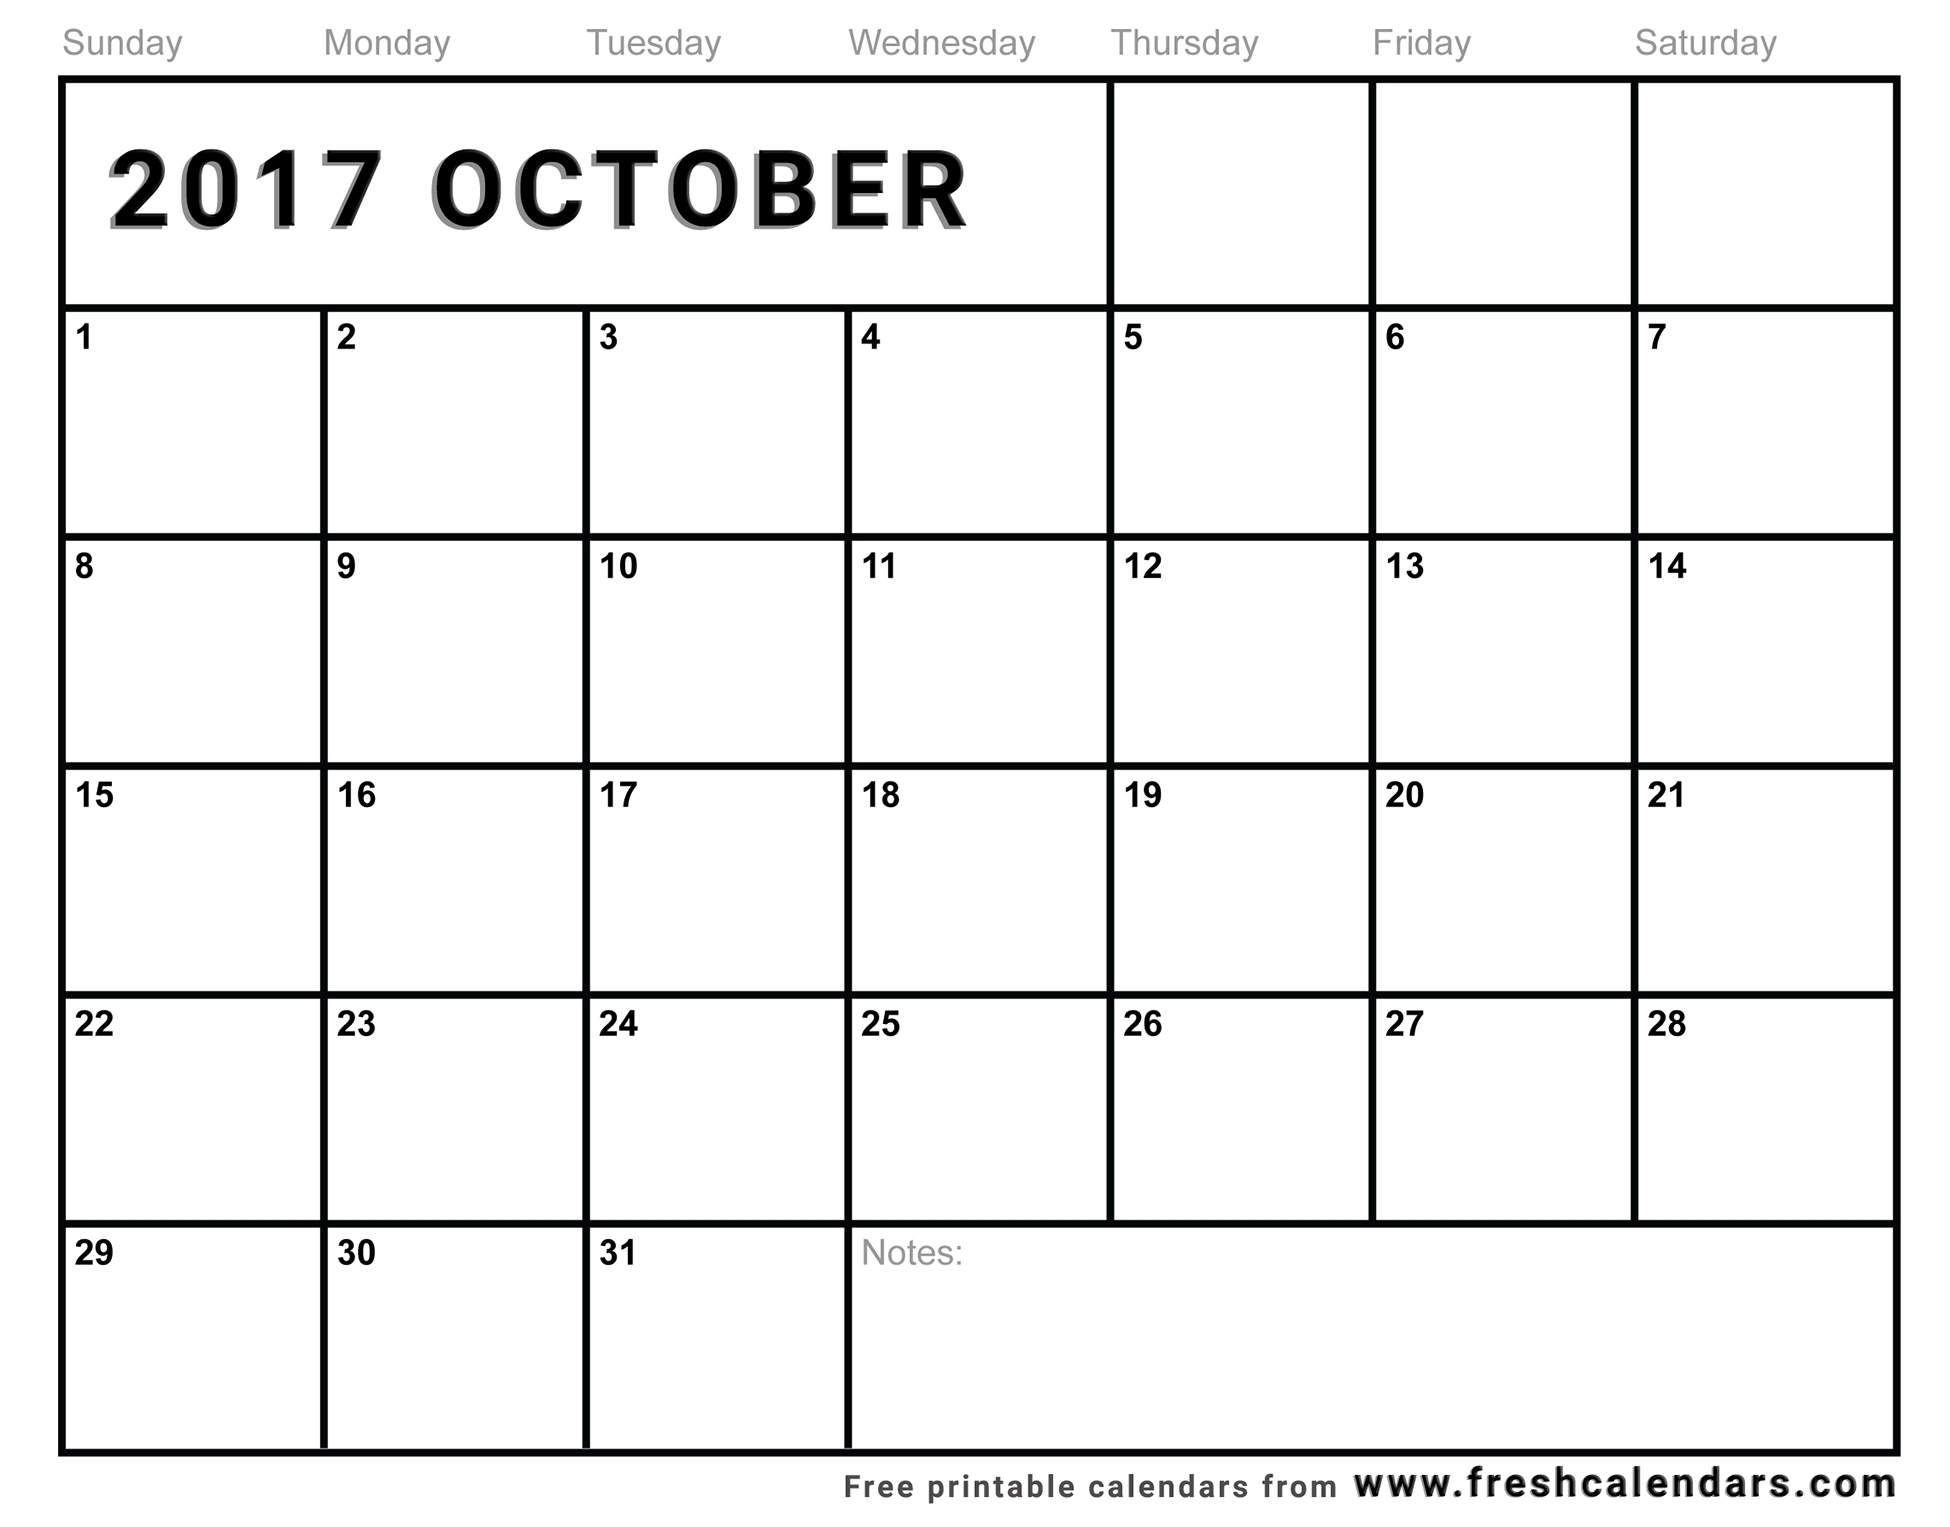 October 2017 Calendar Printable - Fresh Calendars inside Free Editable Monthly Calendar Printable